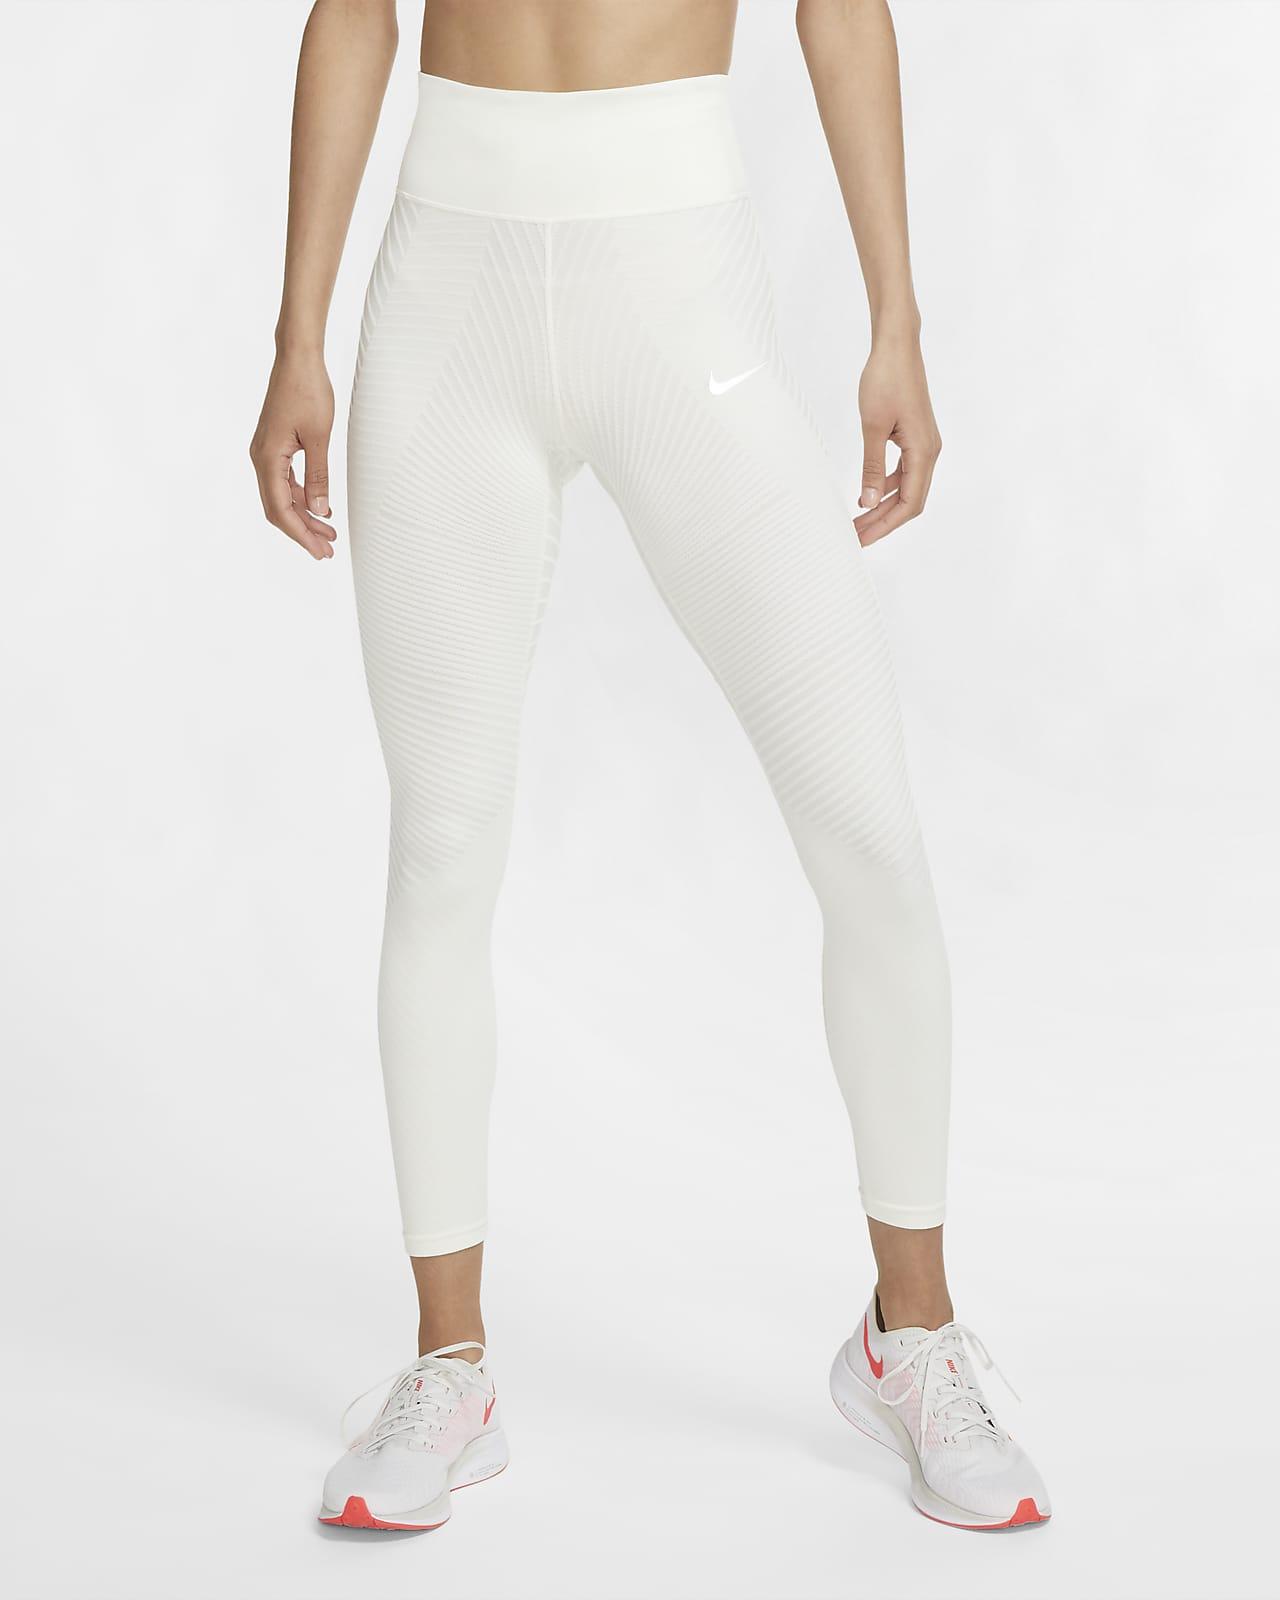 Nike Epic Luxe Women's Textured Running Leggings